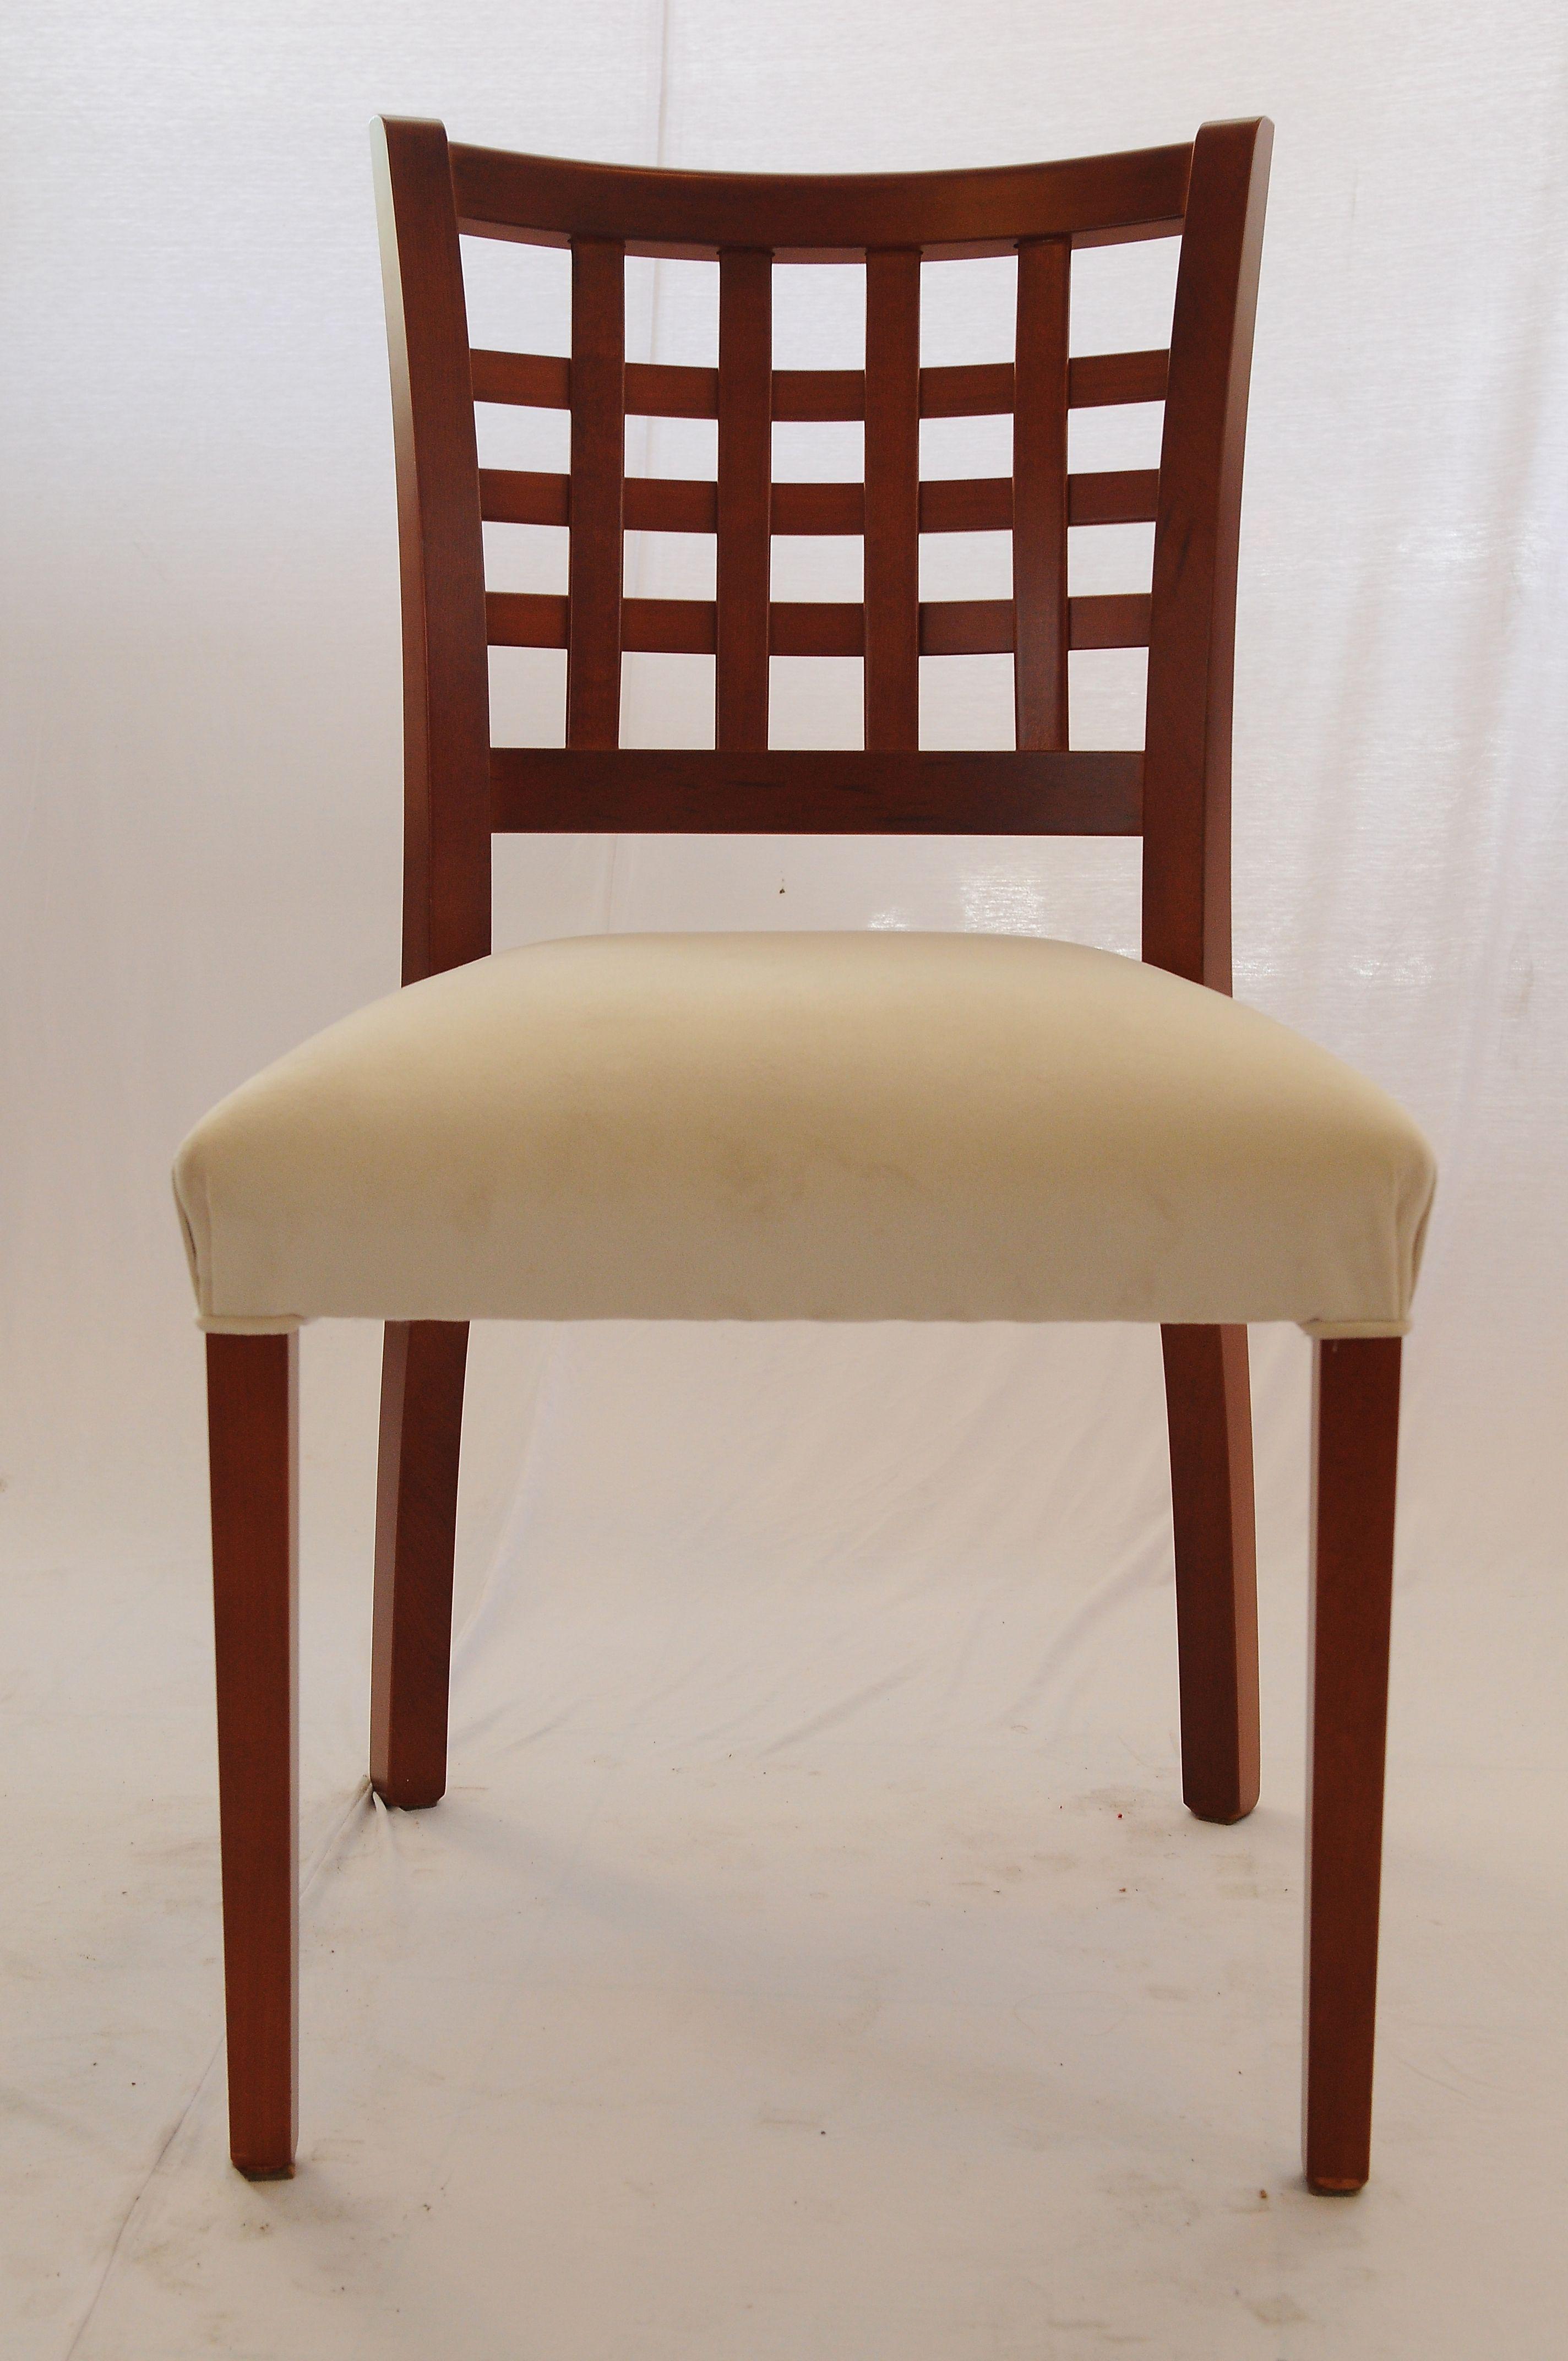 Selema Industria Dise O C Rdoba 2698 Paraguay 851 Rosario  # Muebles Santa Fe